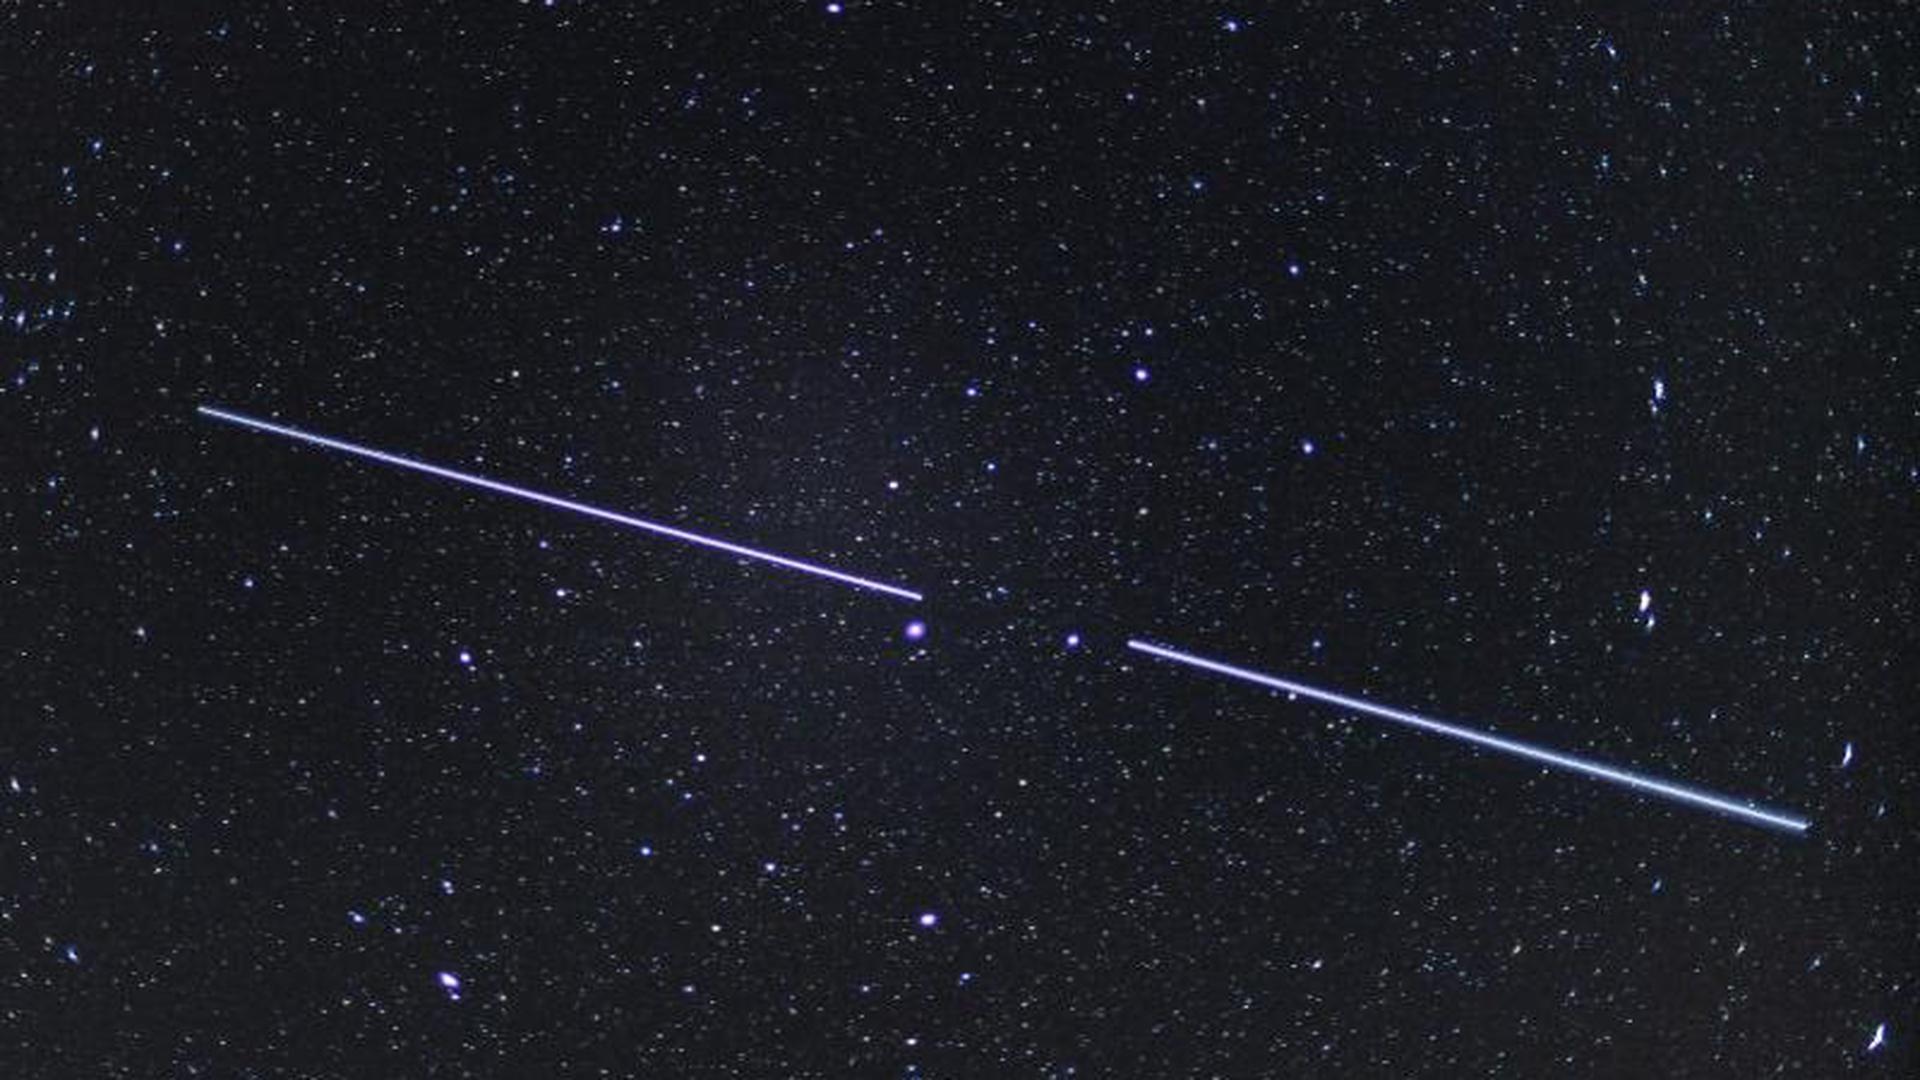 Musk Satelliten Kette